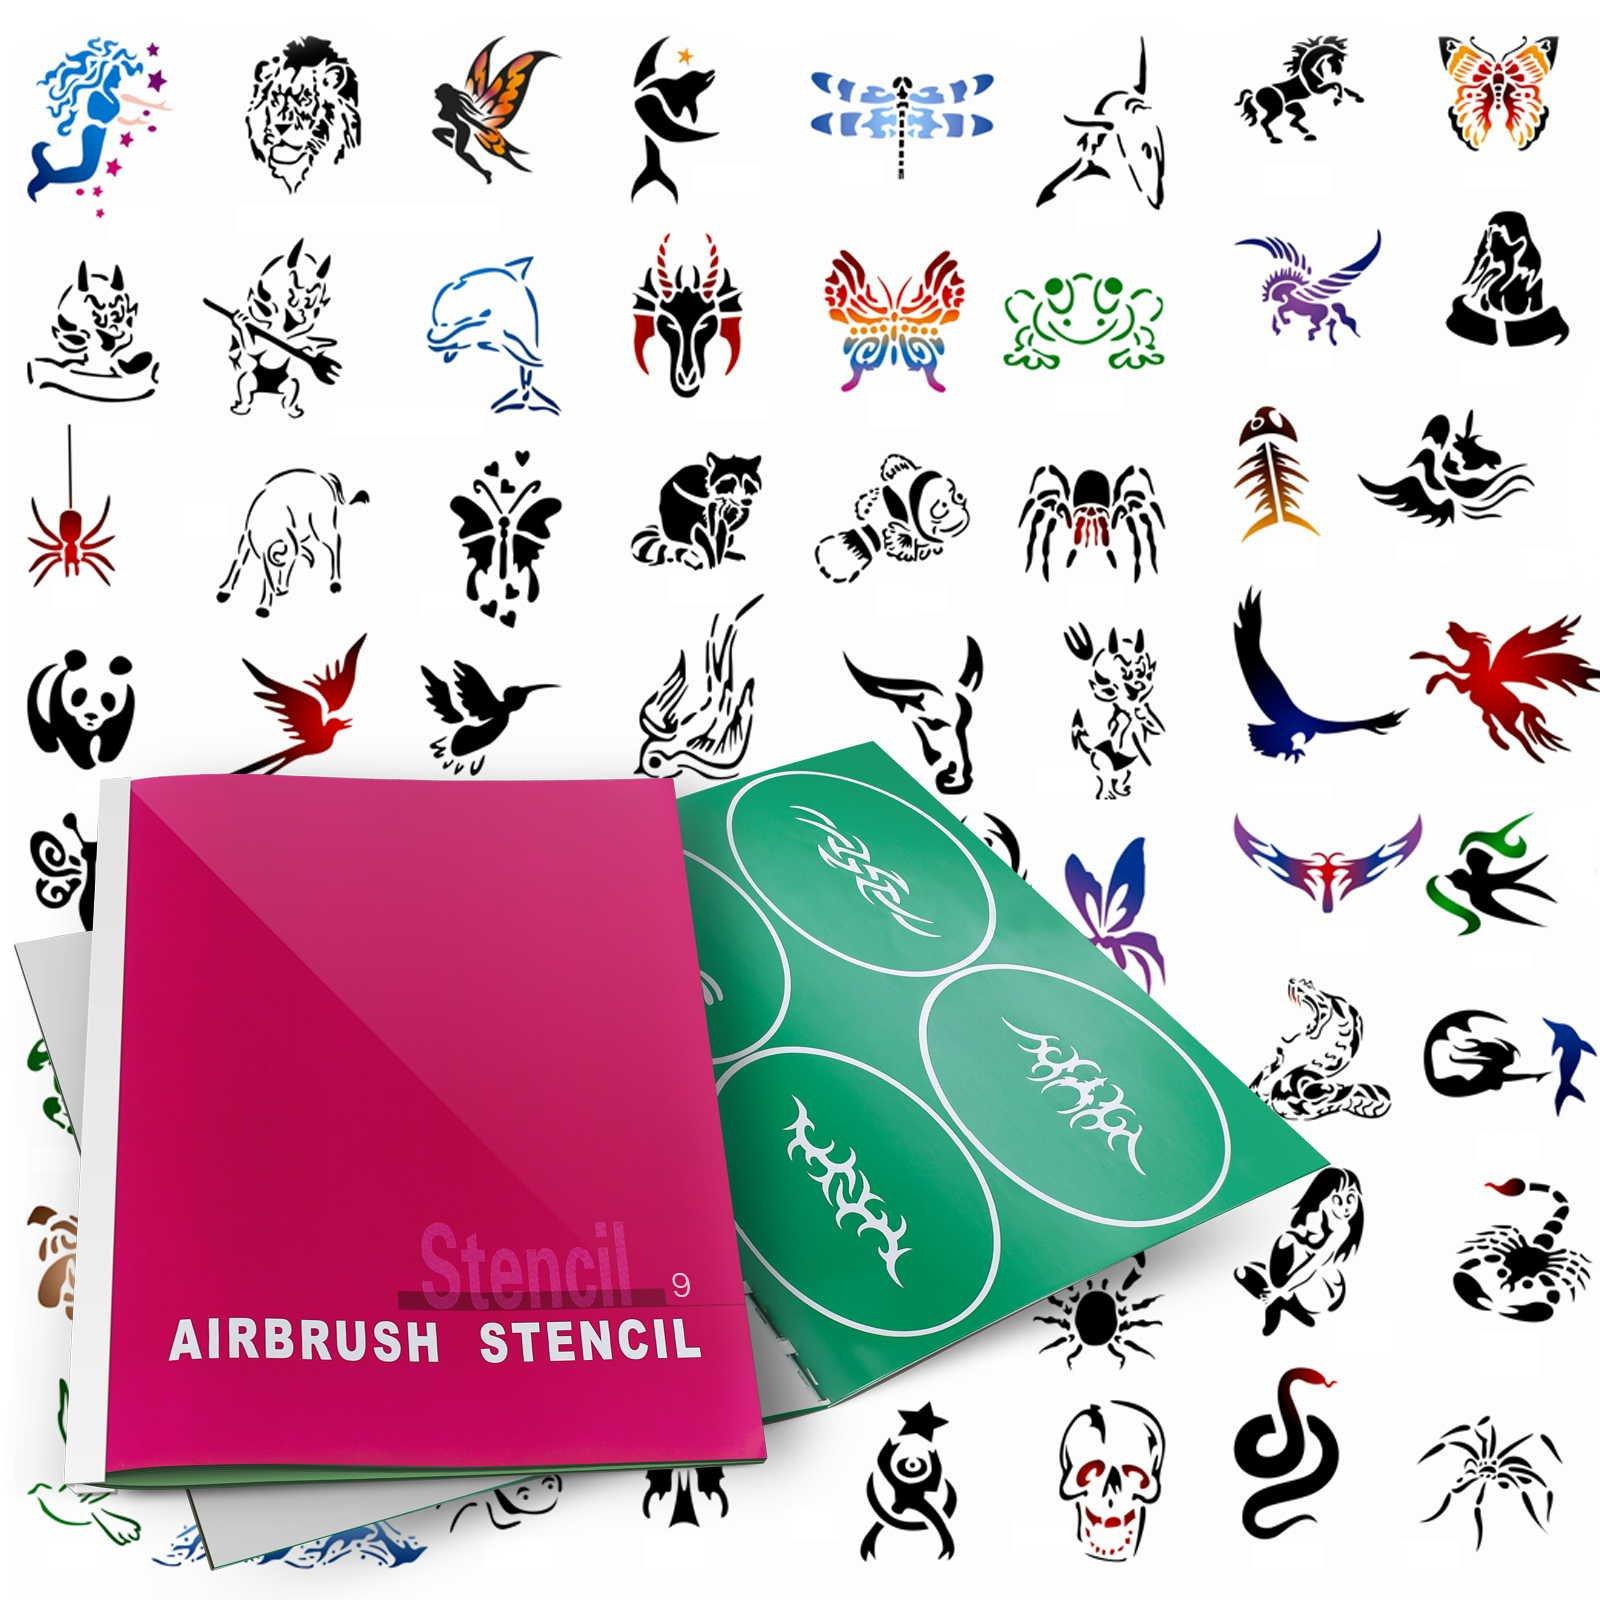 PointZero Temporary Tattoo Airbrush Stencils 100 Designs - Book 9